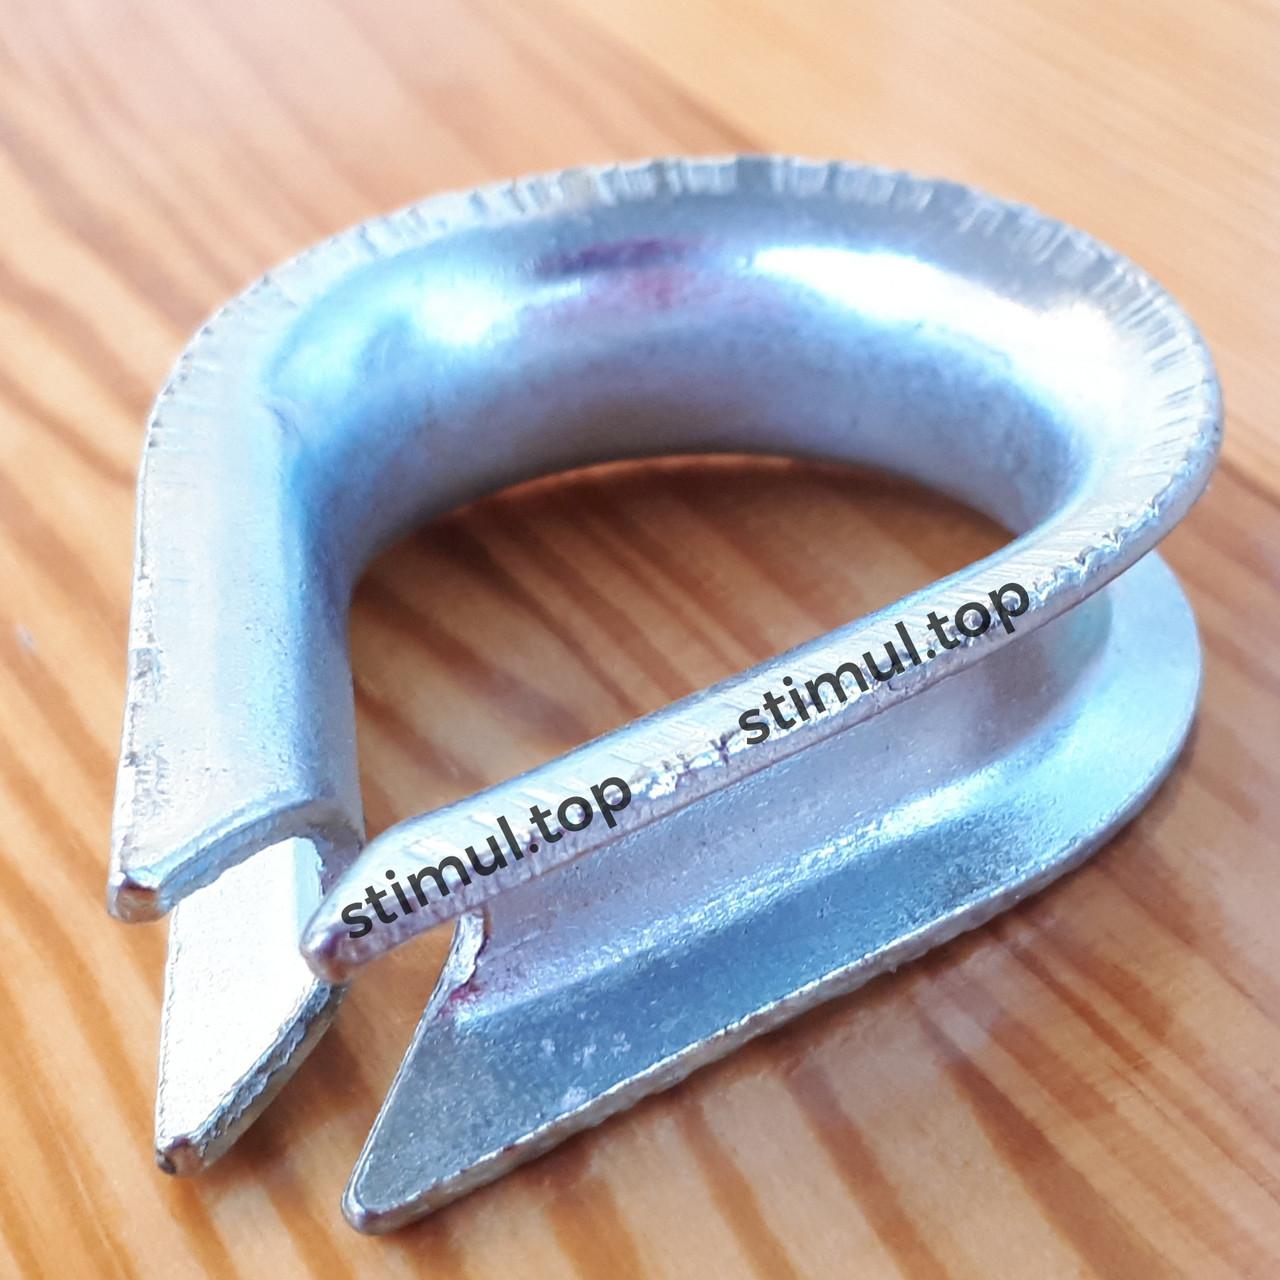 Коуш для троса Ø 5 мм   DIN 6899   Коуш для стальных канатов оцинкованный   Коуши оцинковані для канатів